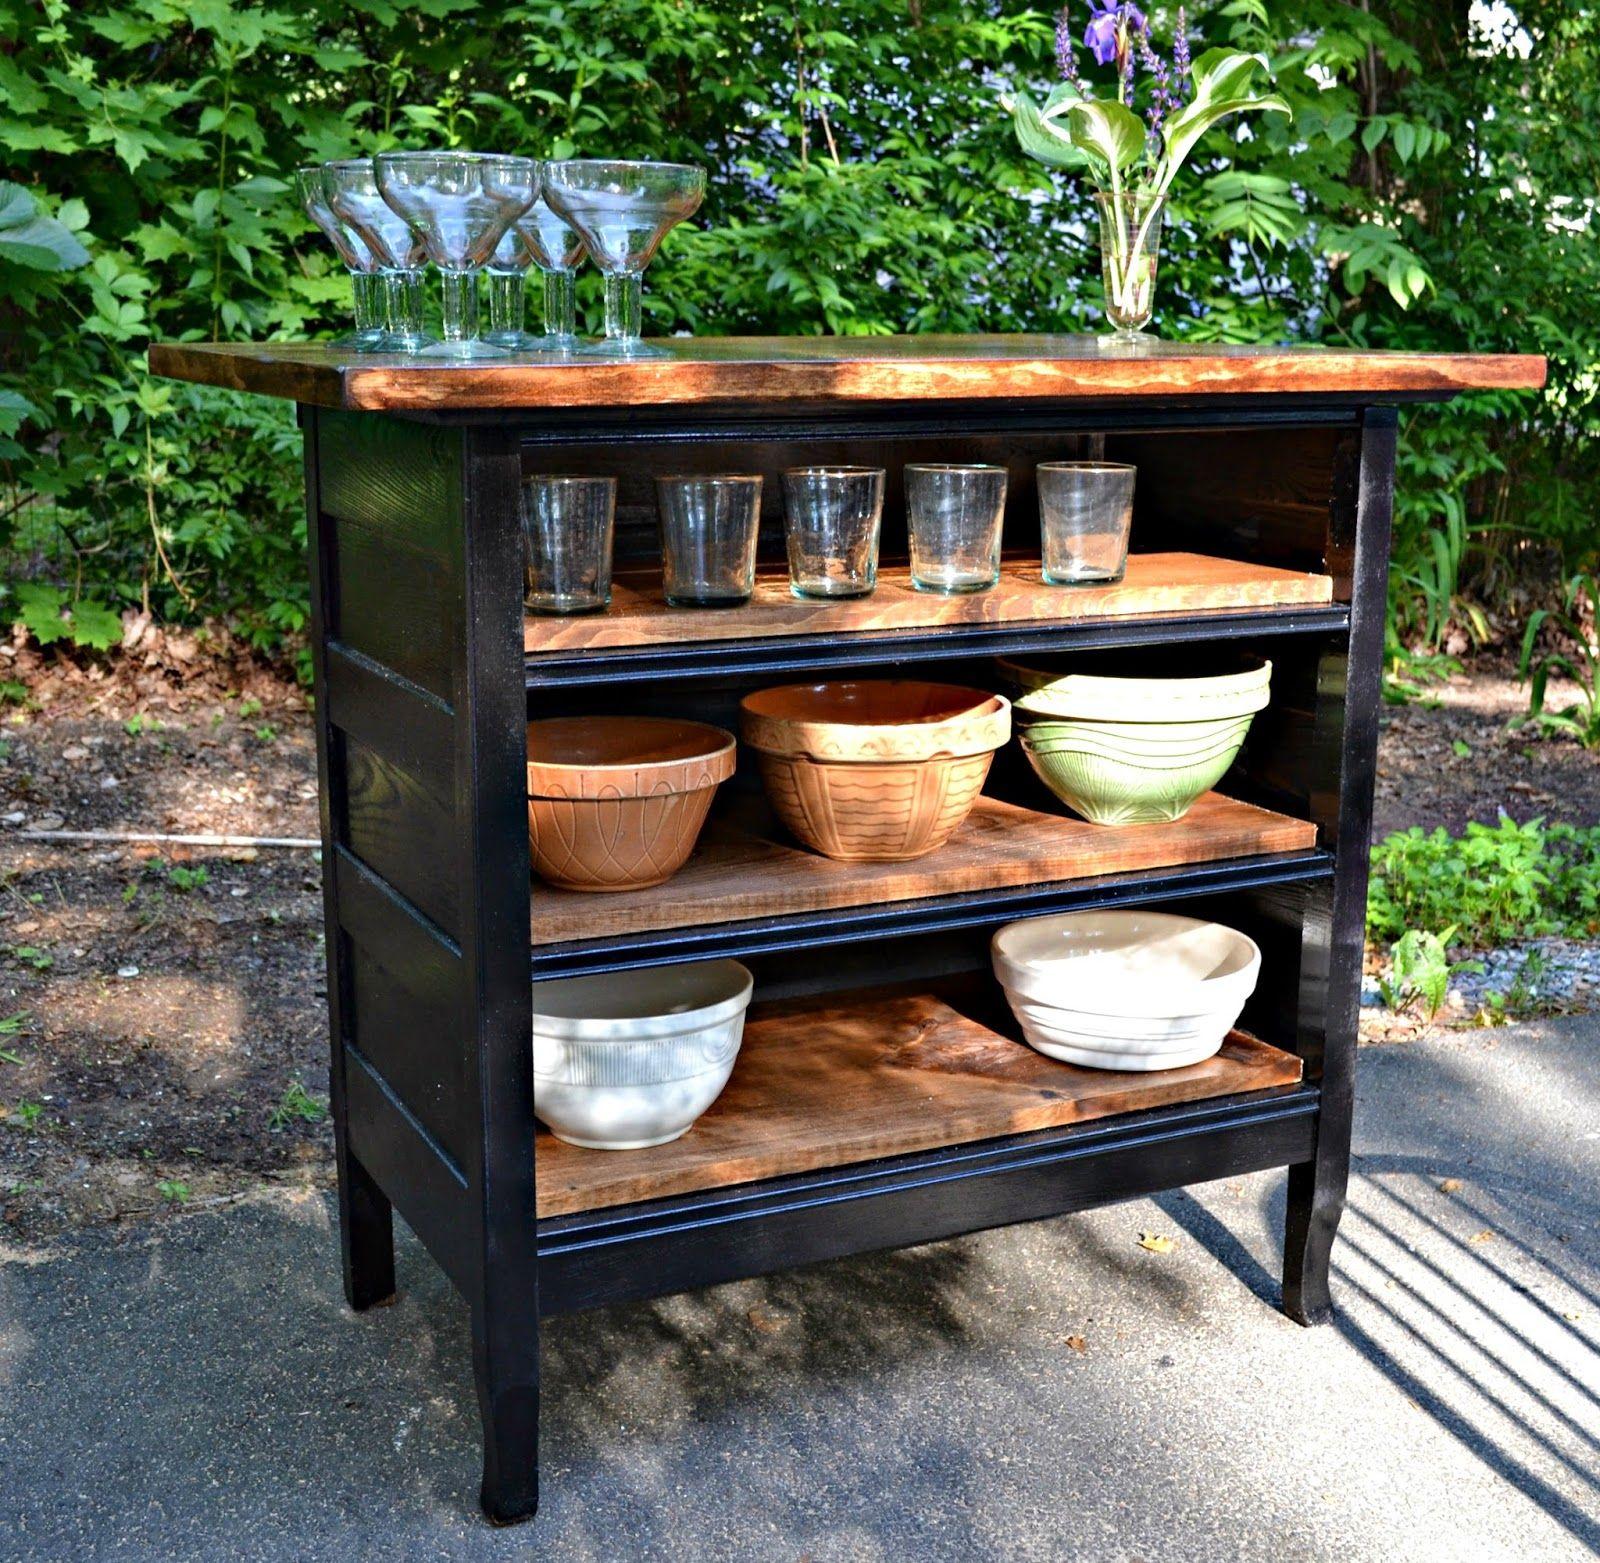 Antique solid oak th century dresser turned kitchen island in